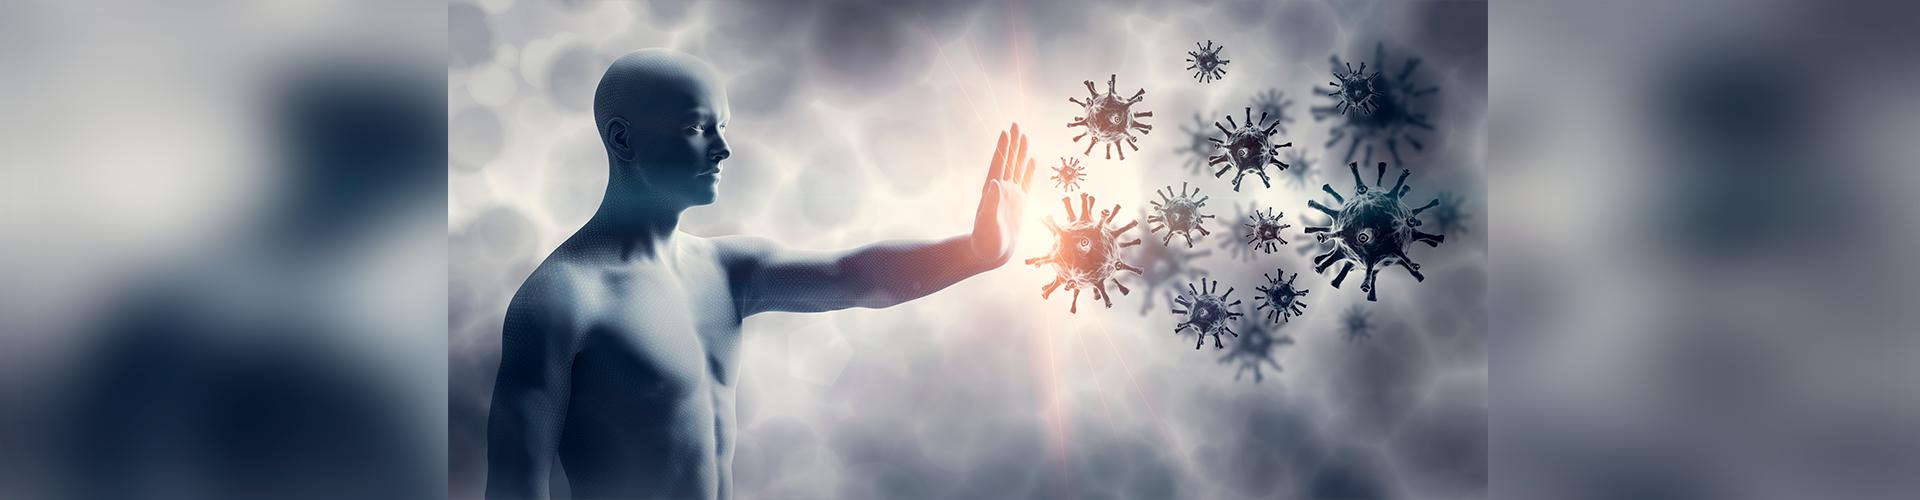 blog-I-migliori-integratori-per-le-difese-immunitarie